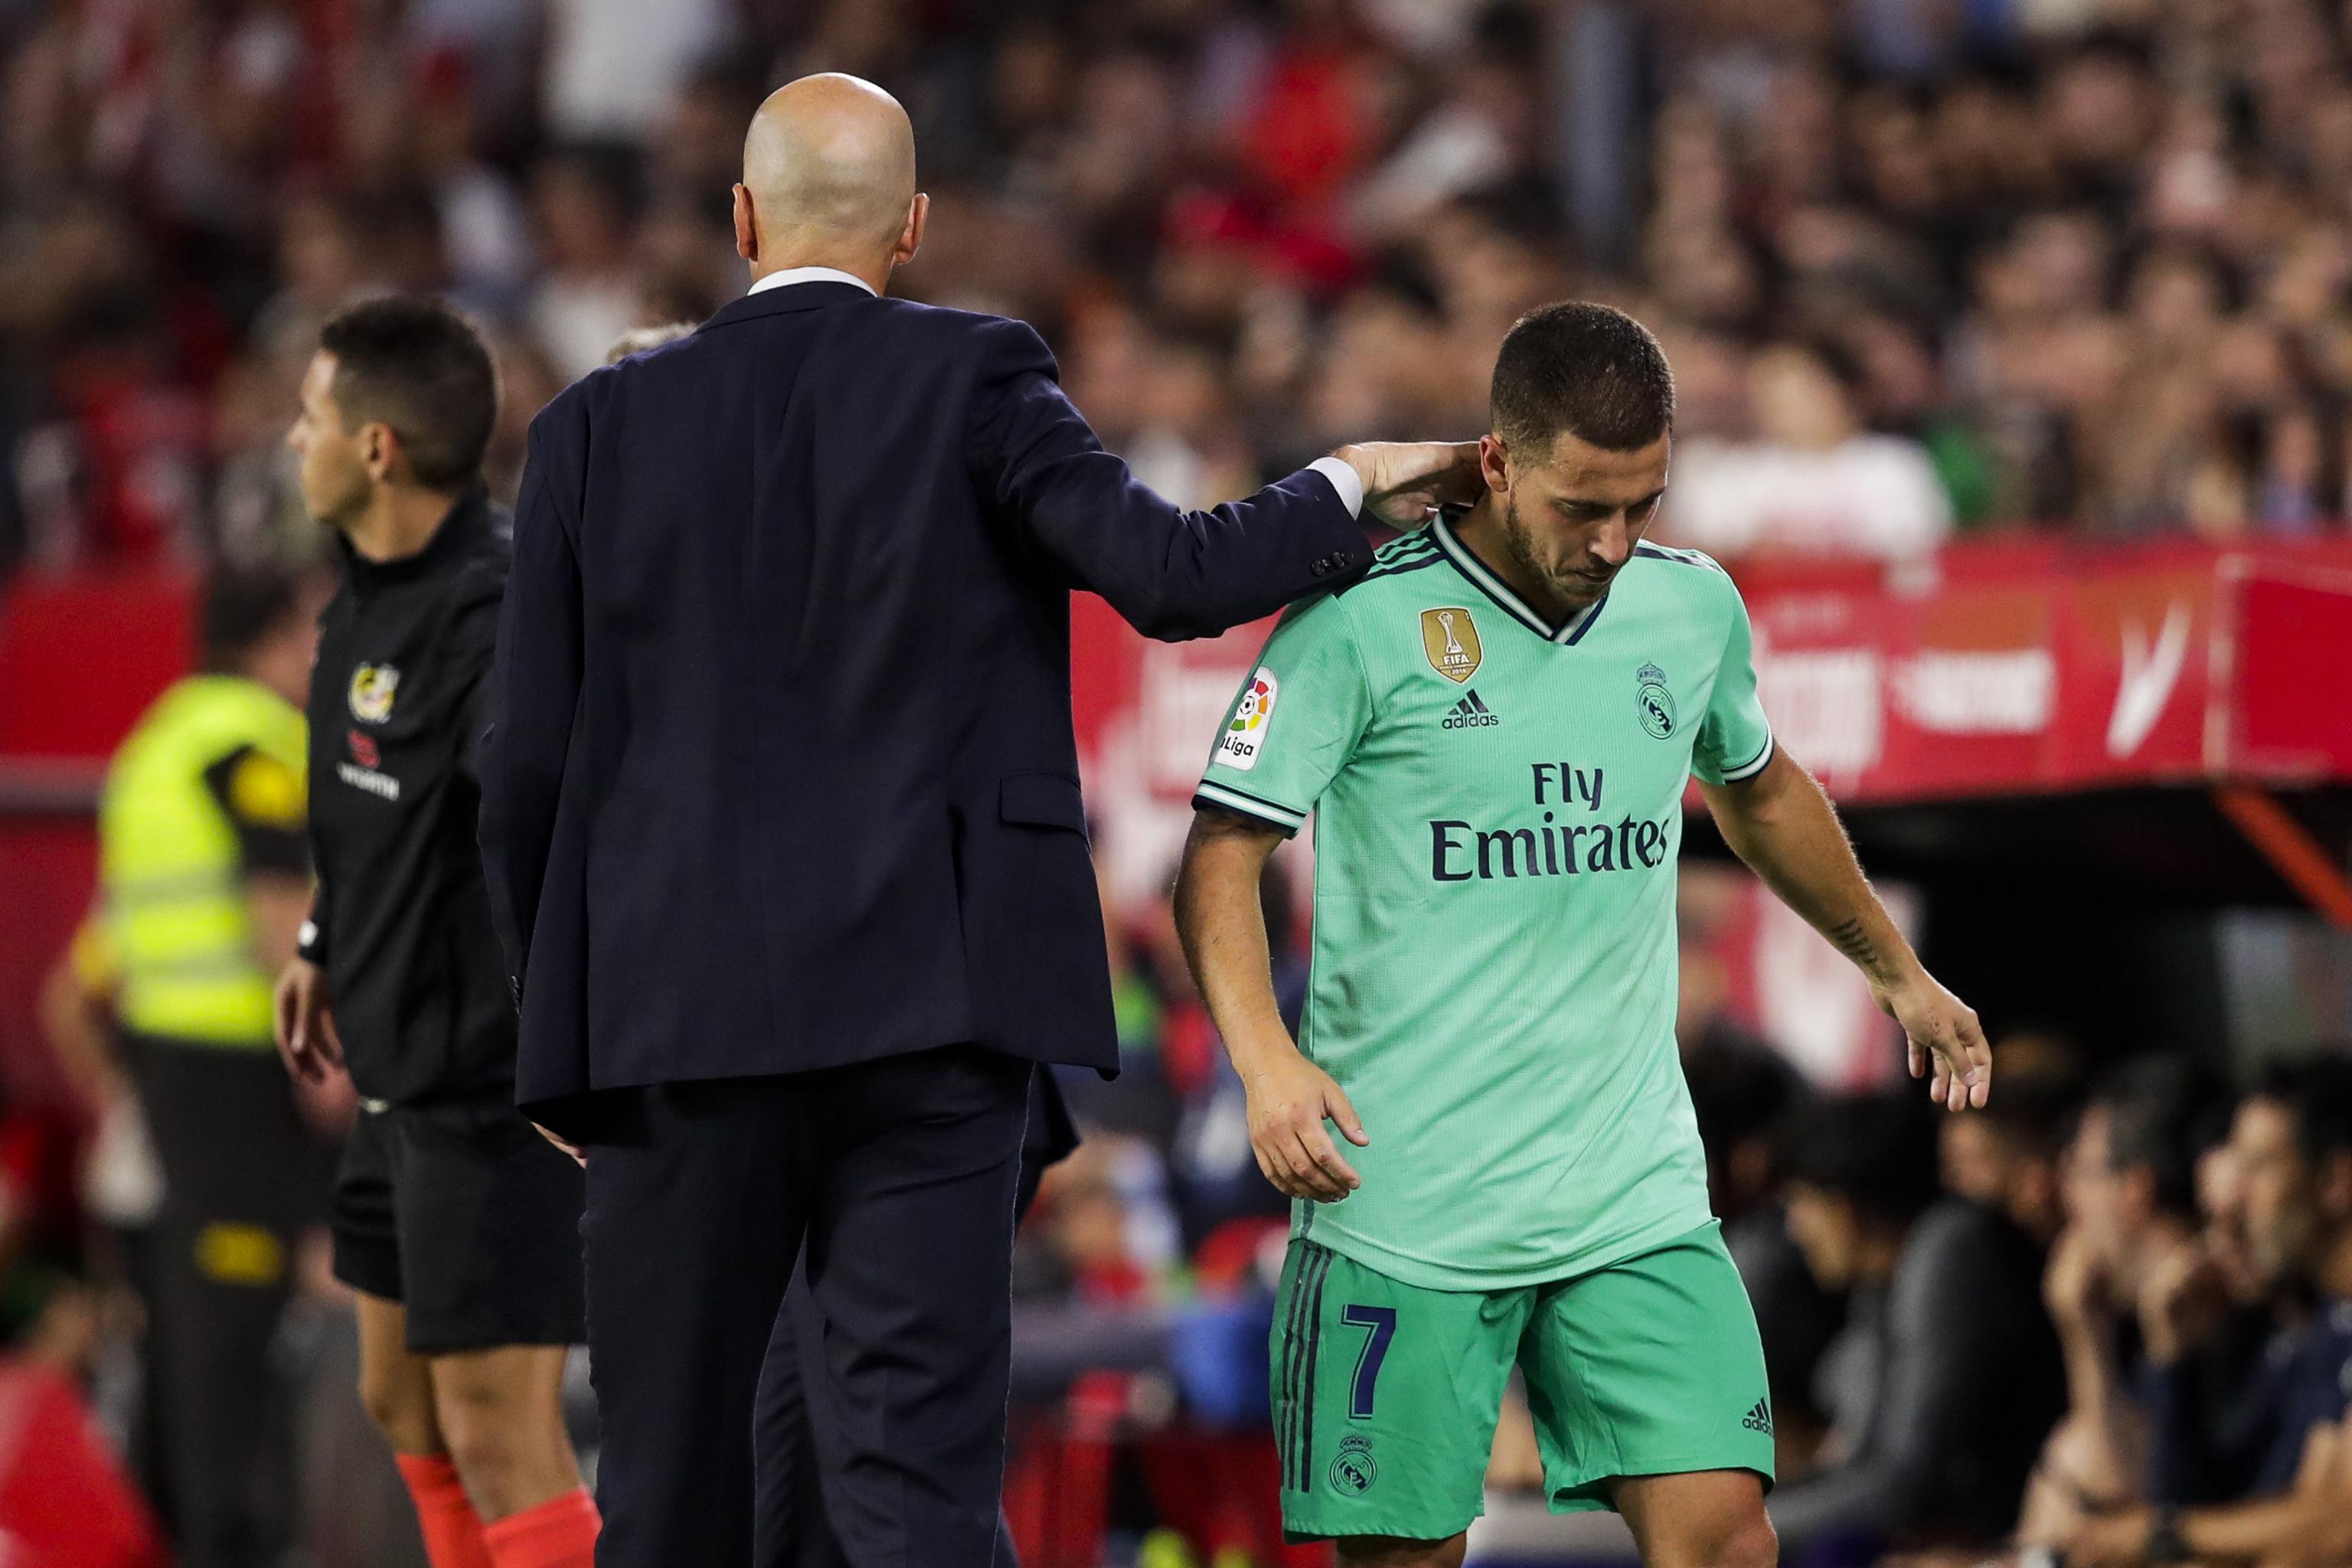 Alasan Zidane Belom Menjadikan Hazard Starter?